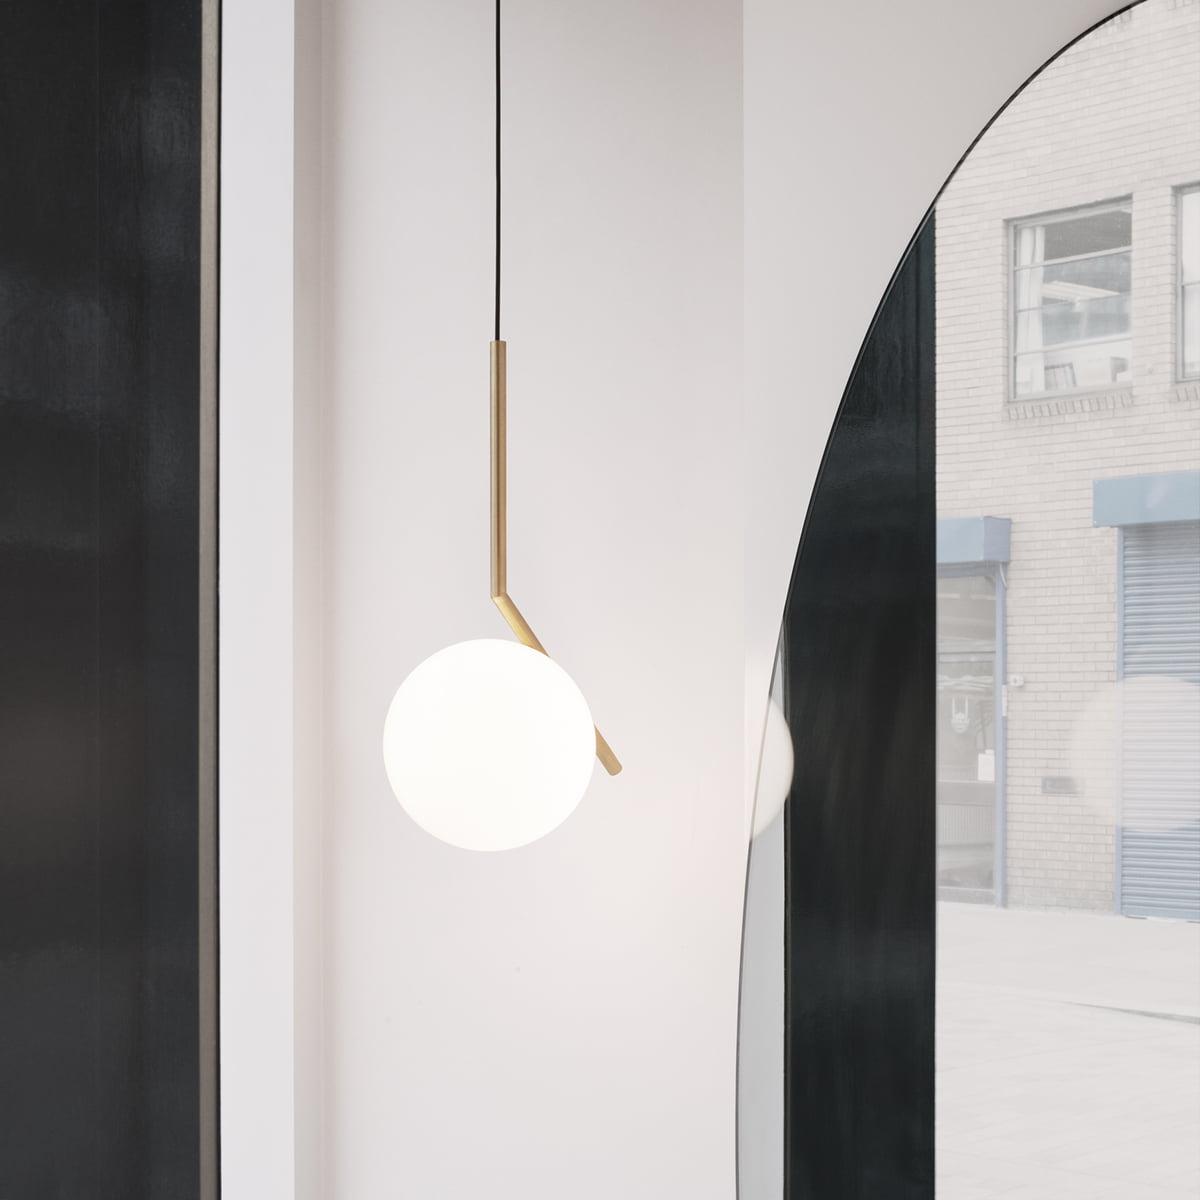 buy online 9872a c77ab Flos - IC S1 BRO Pendant Lamp, chrome